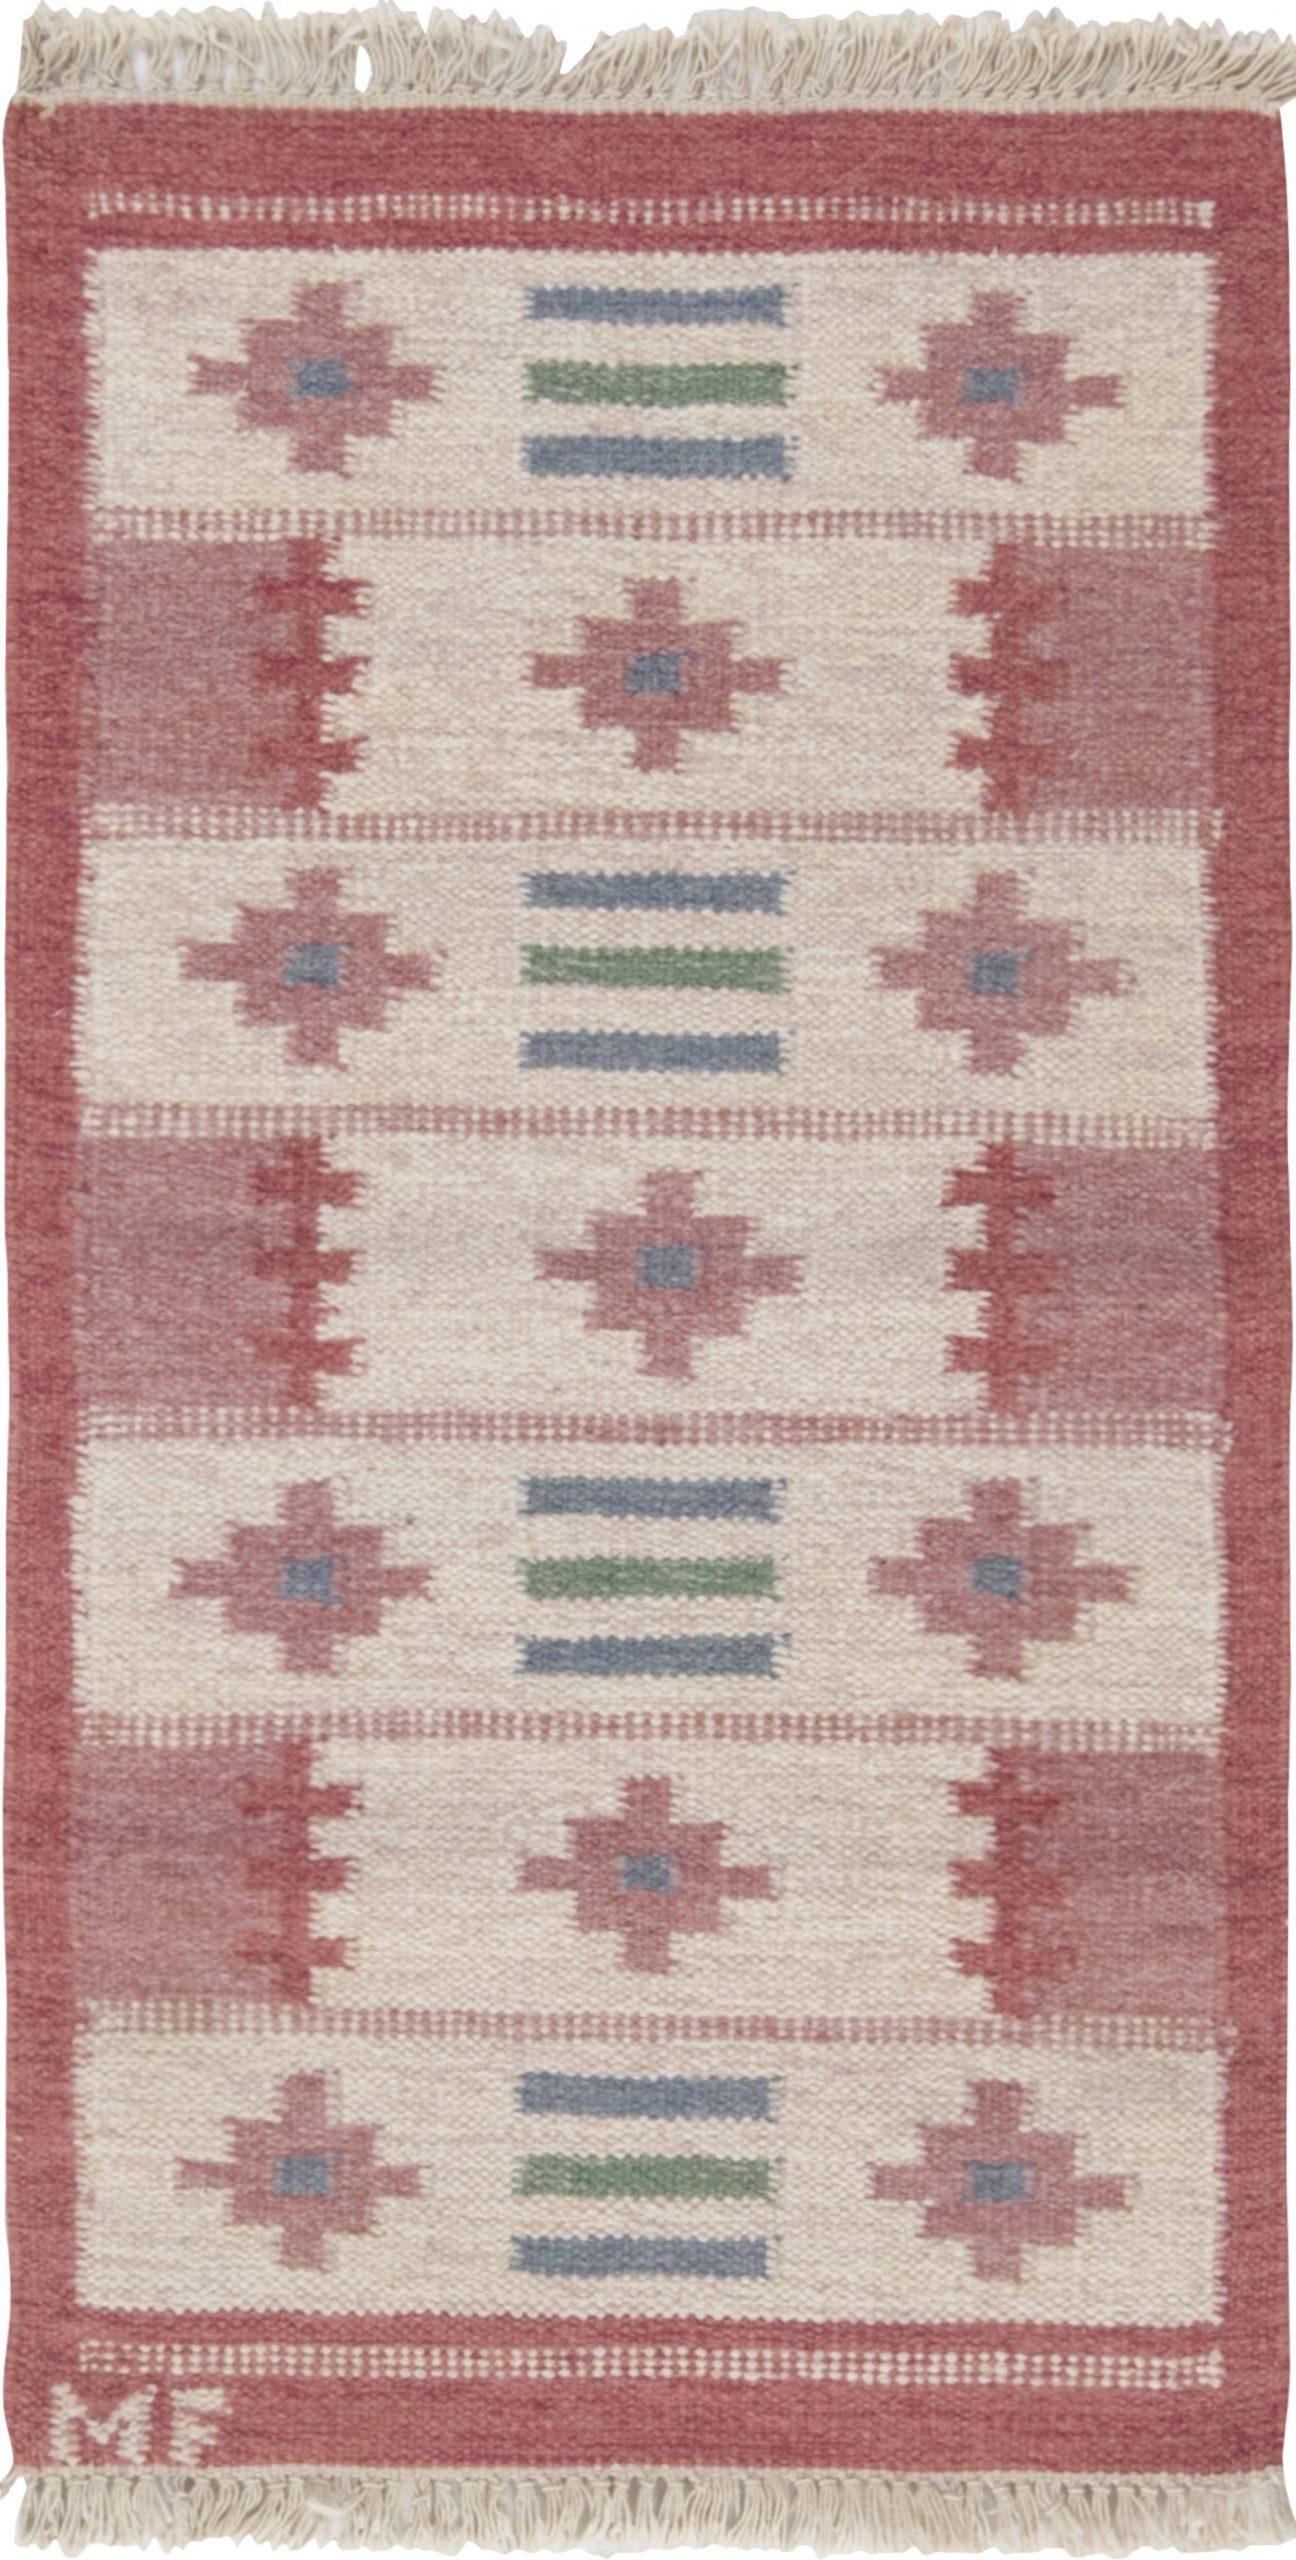 Vintage Swedish flat weave rug signed (MF) BB6543